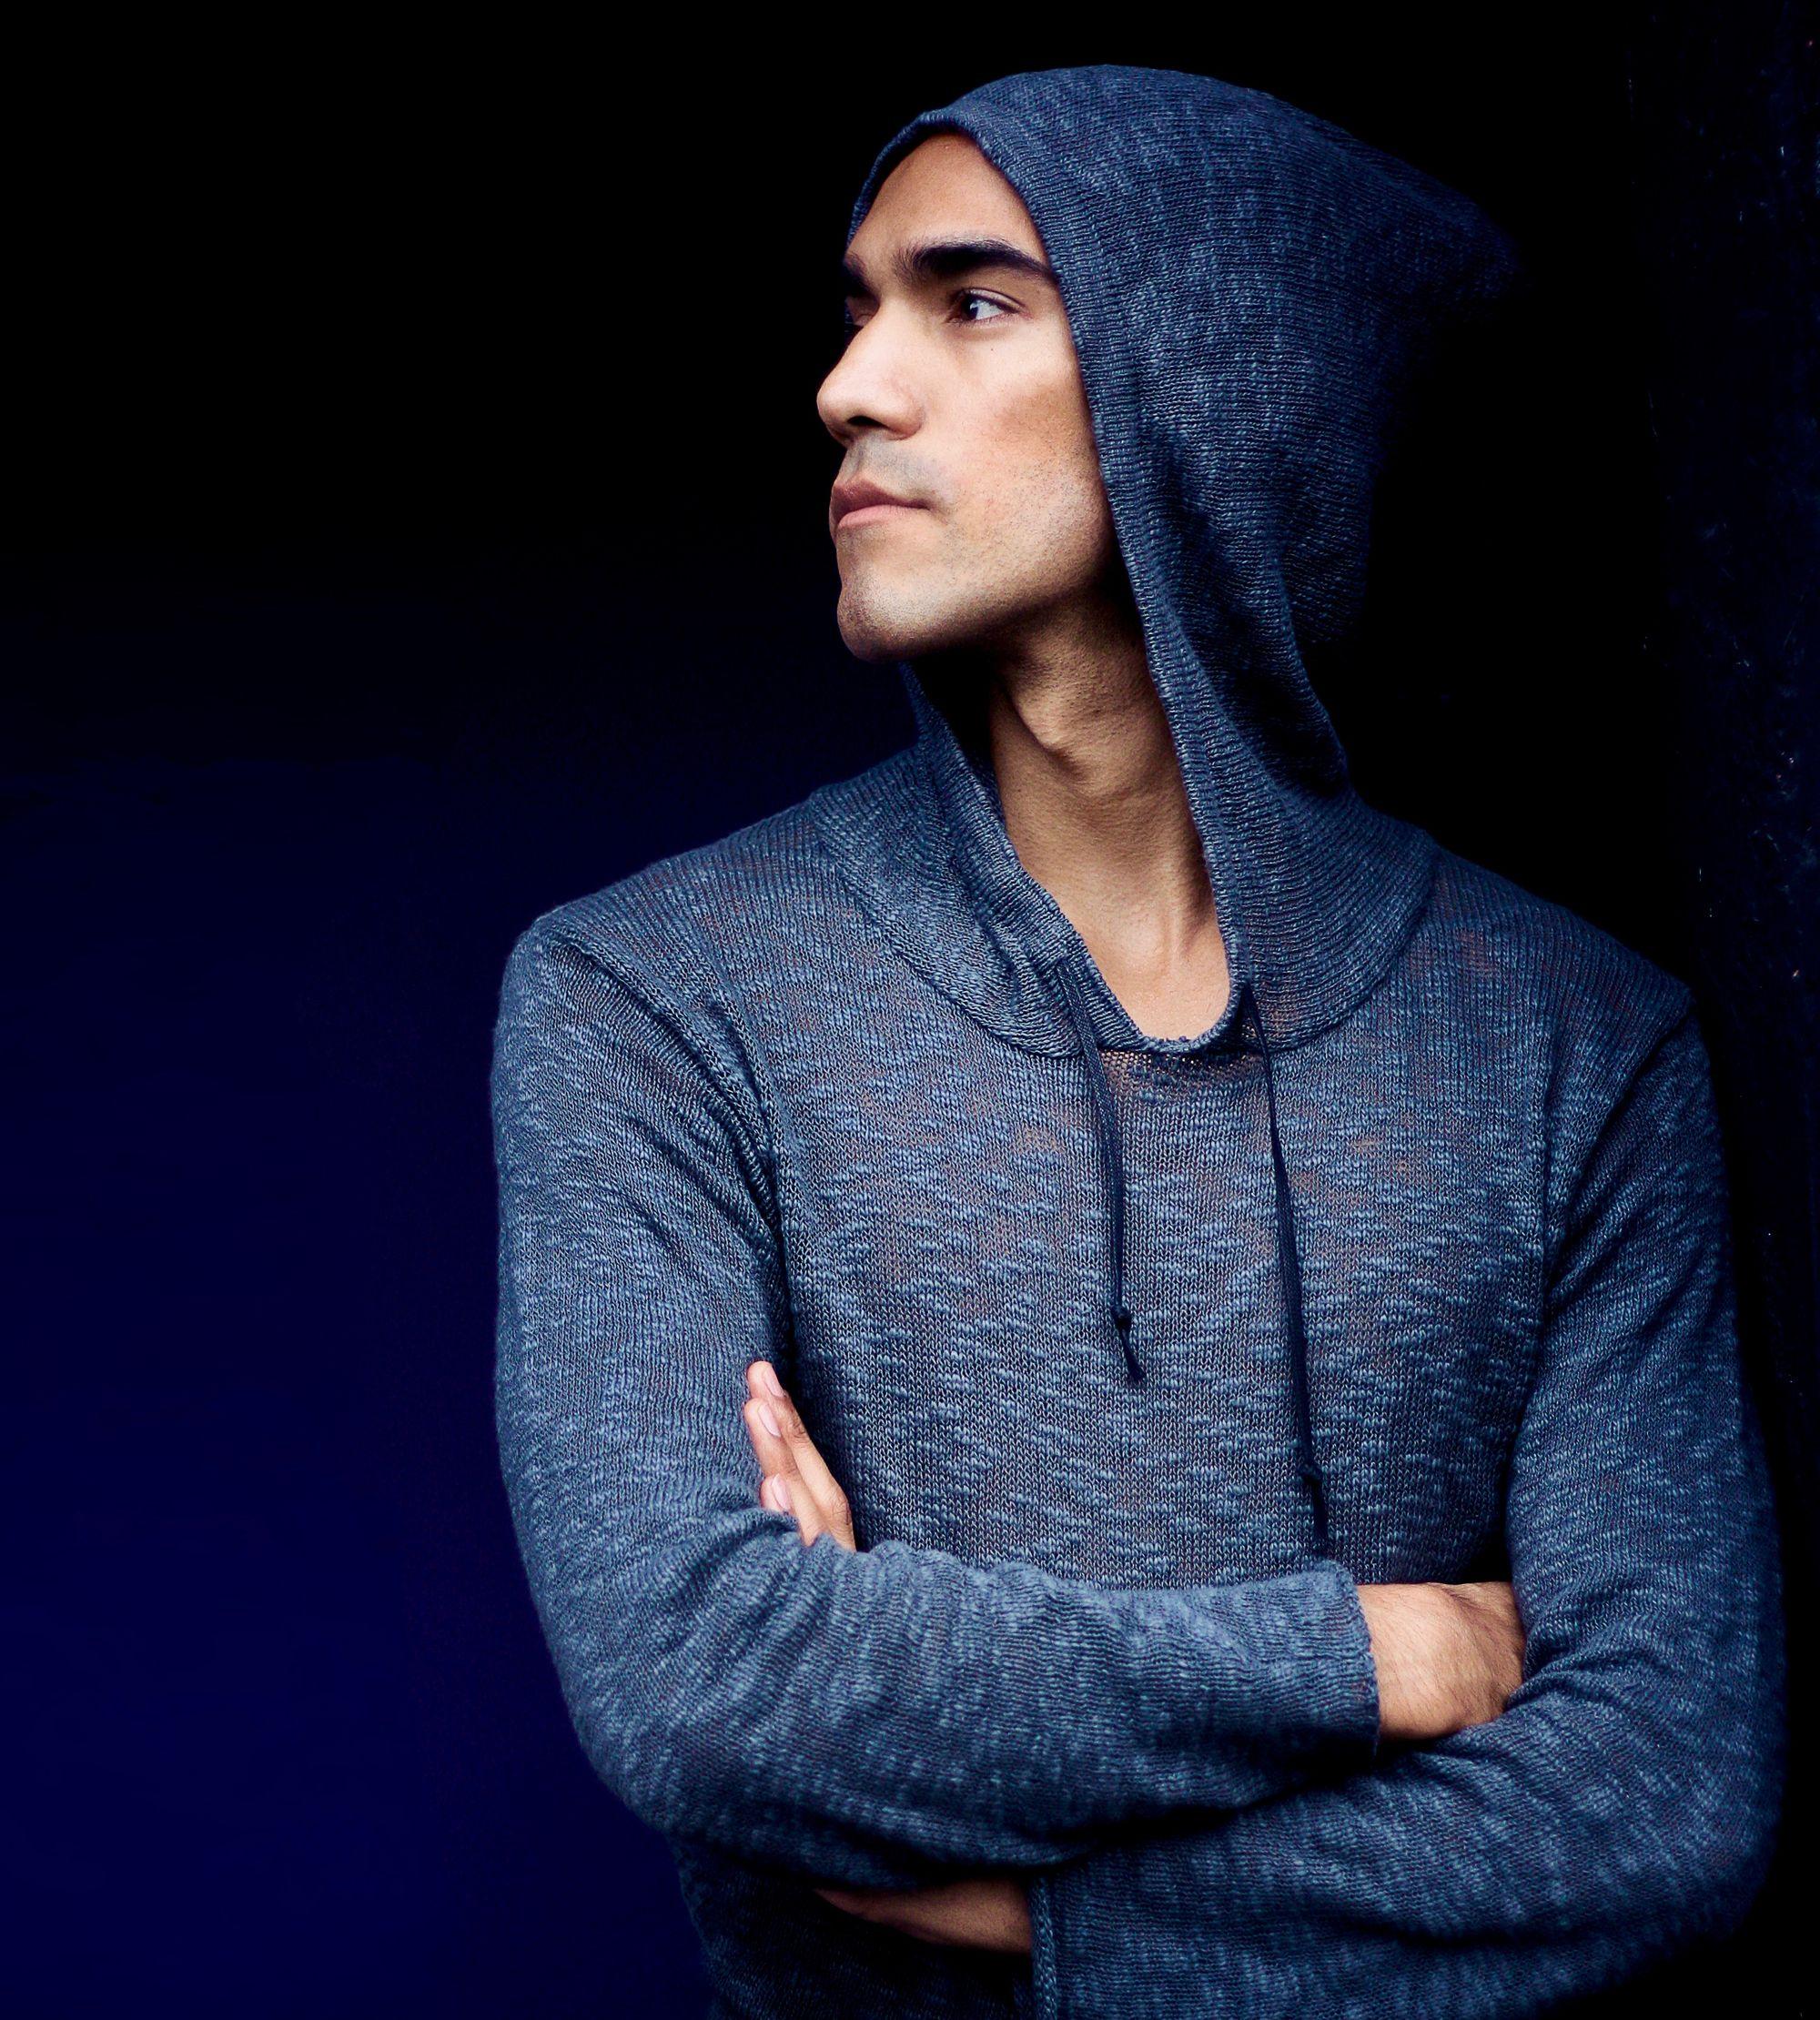 miguel_sweater.jpg